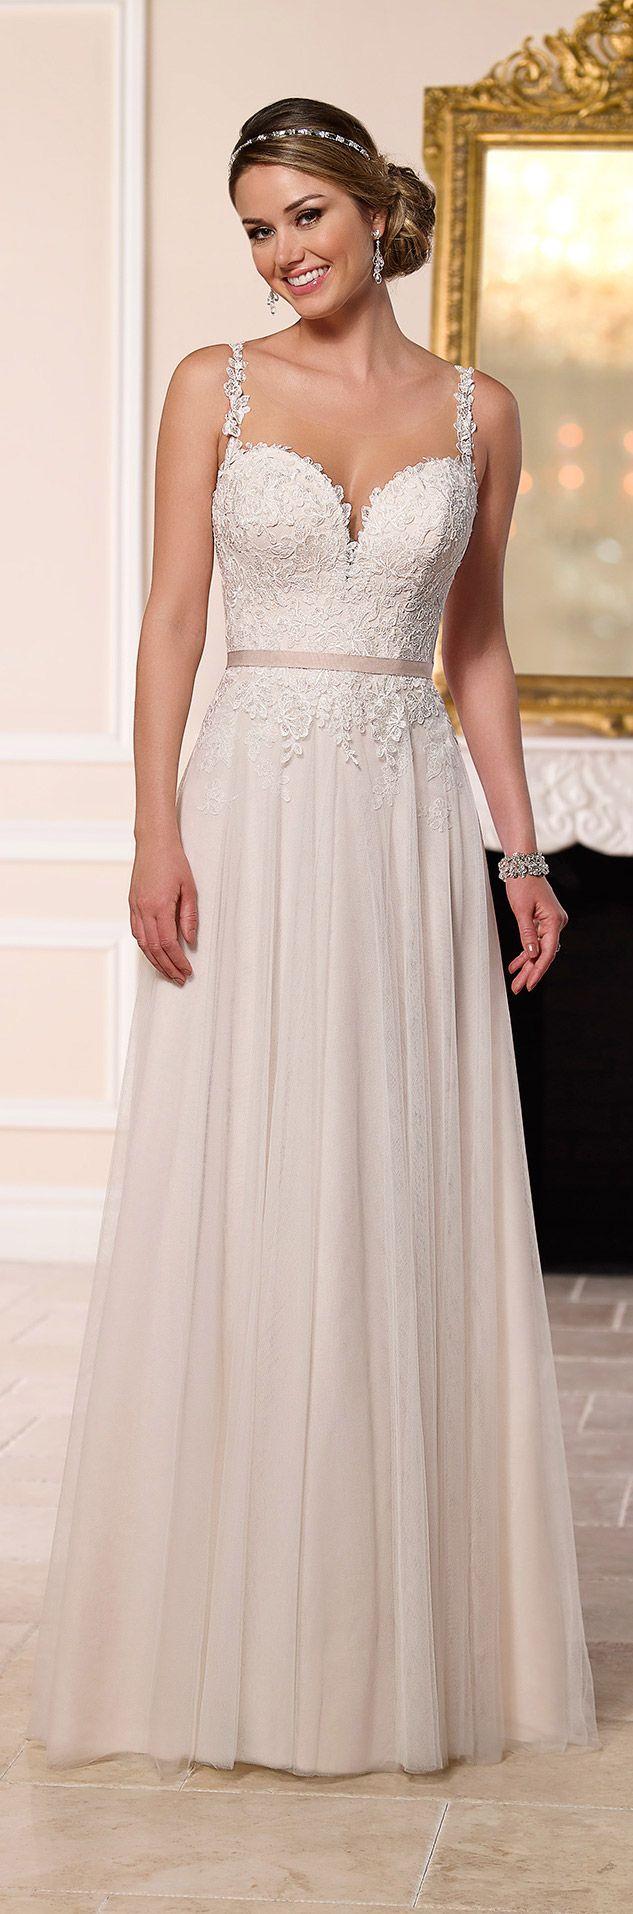 Best 25 blush wedding gowns ideas on pinterest blush for Long dress for wedding reception